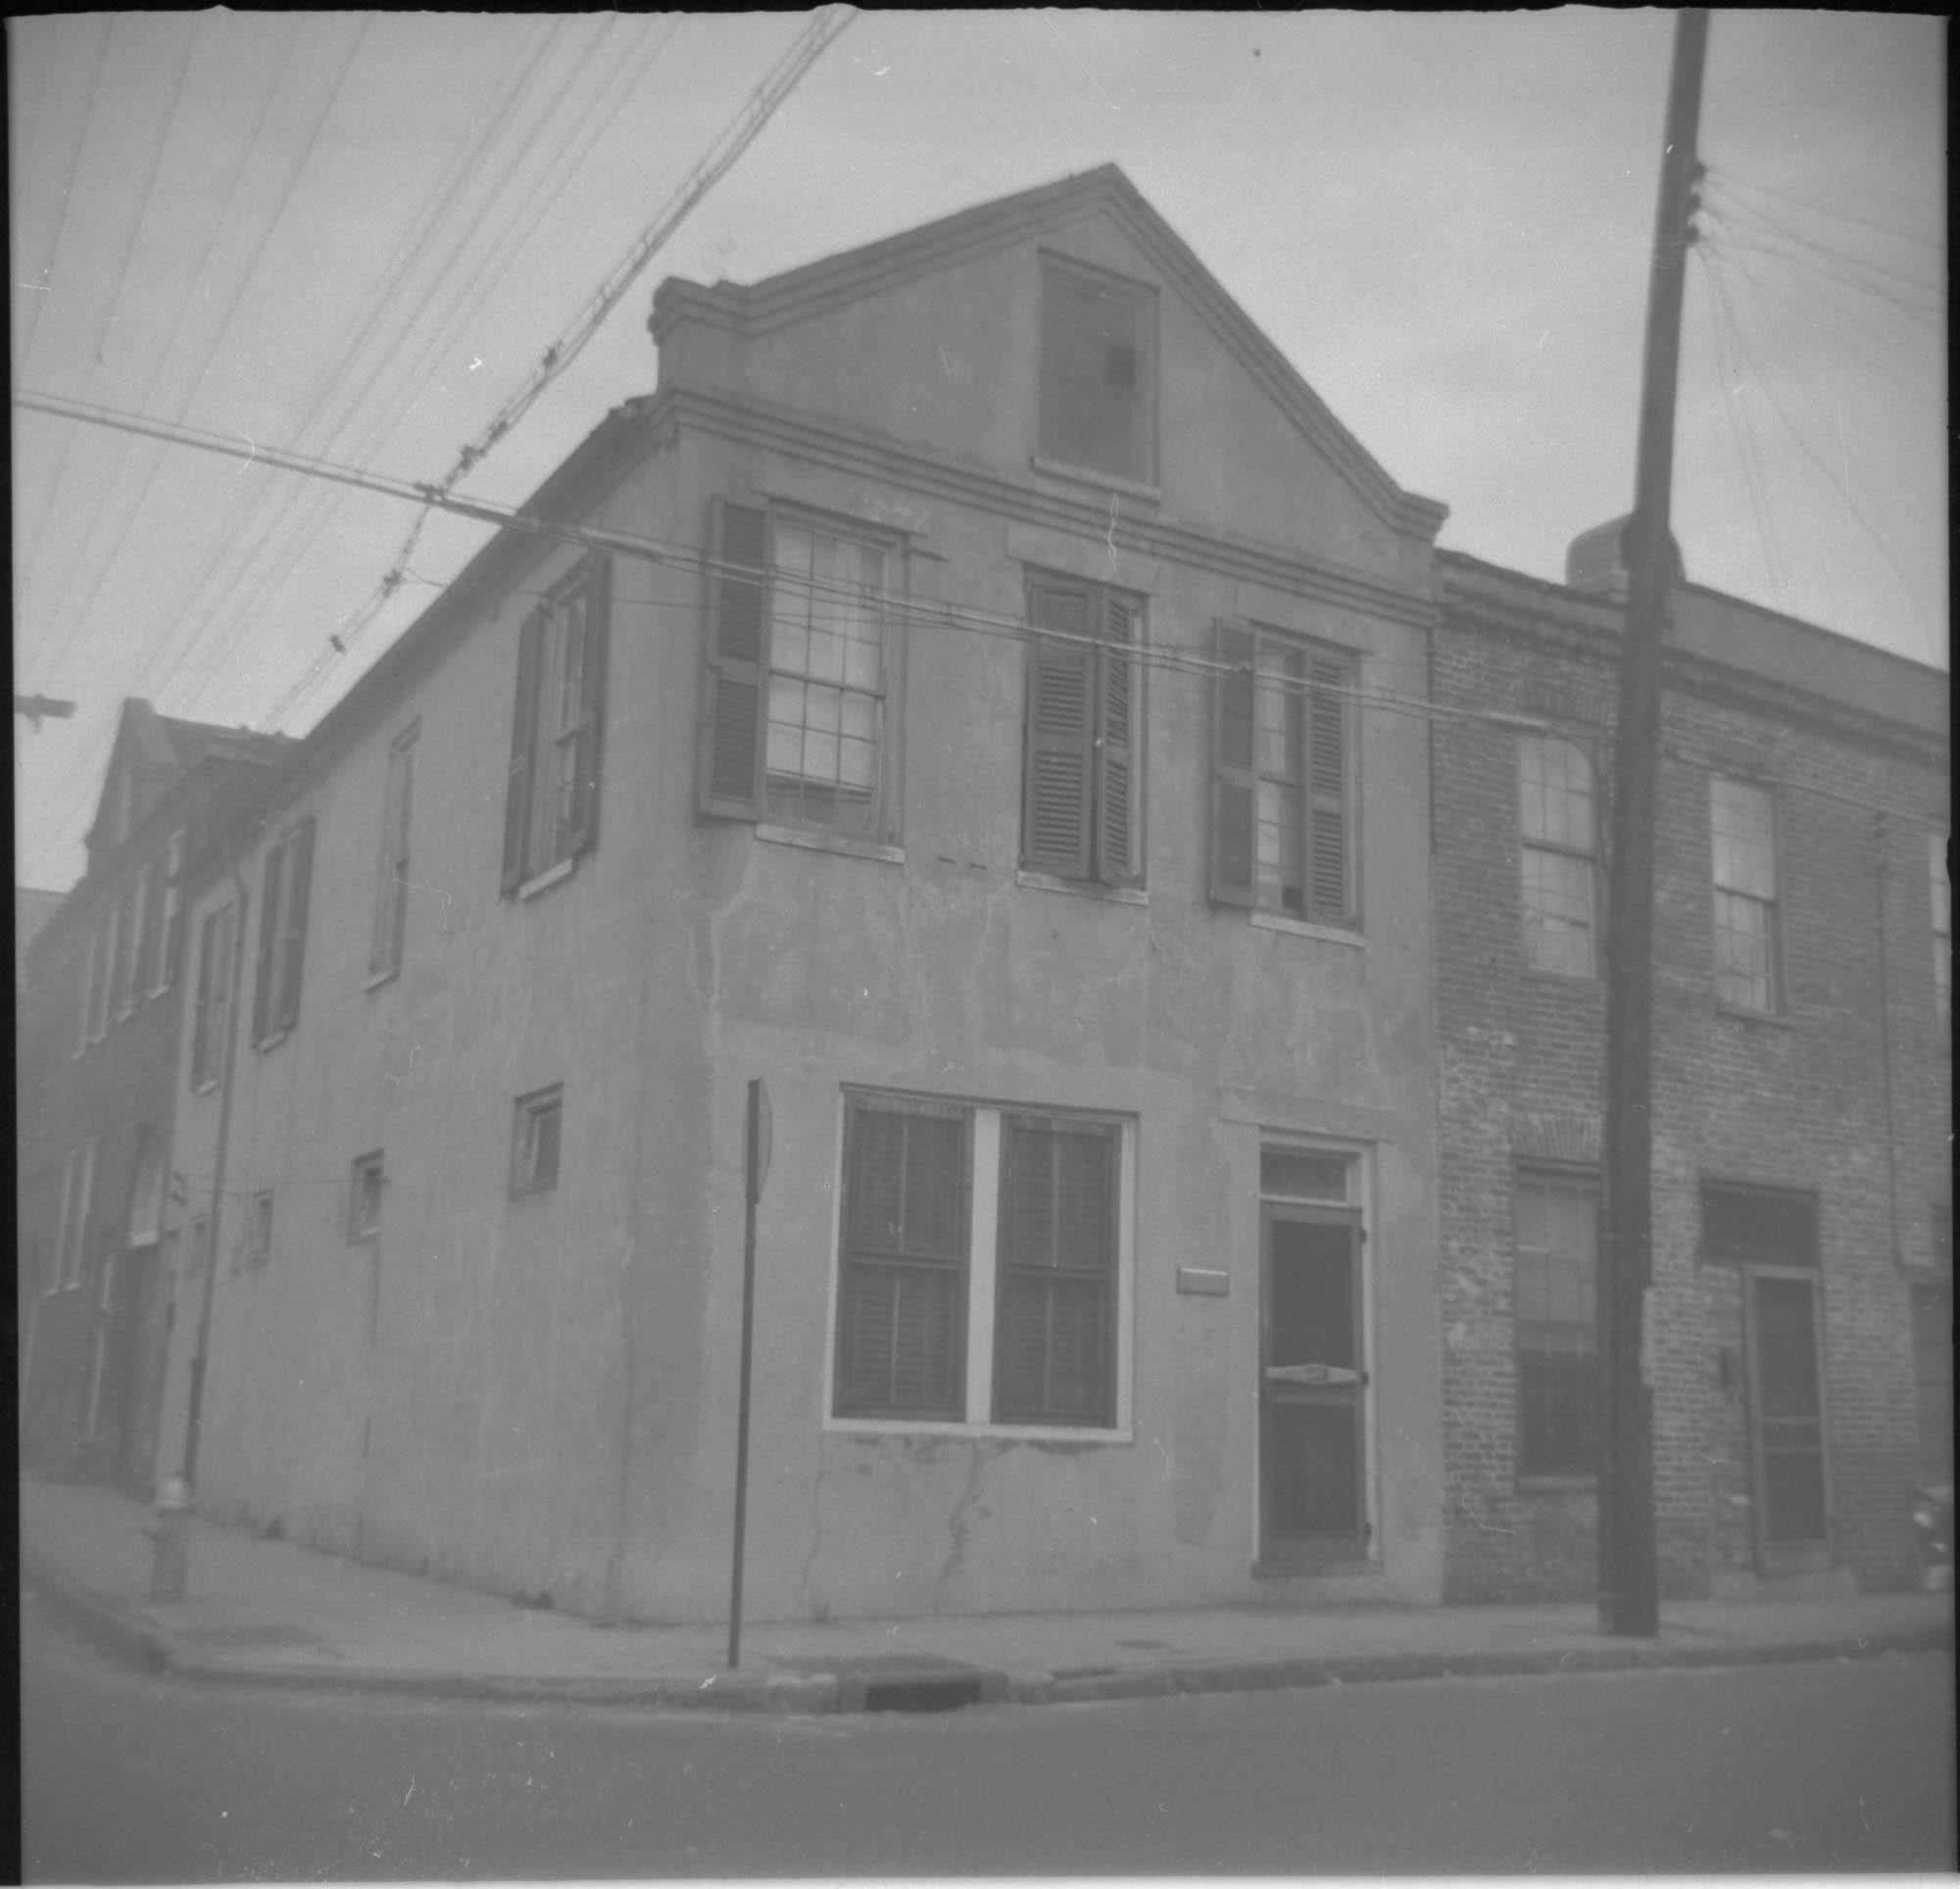 52 Anson Street